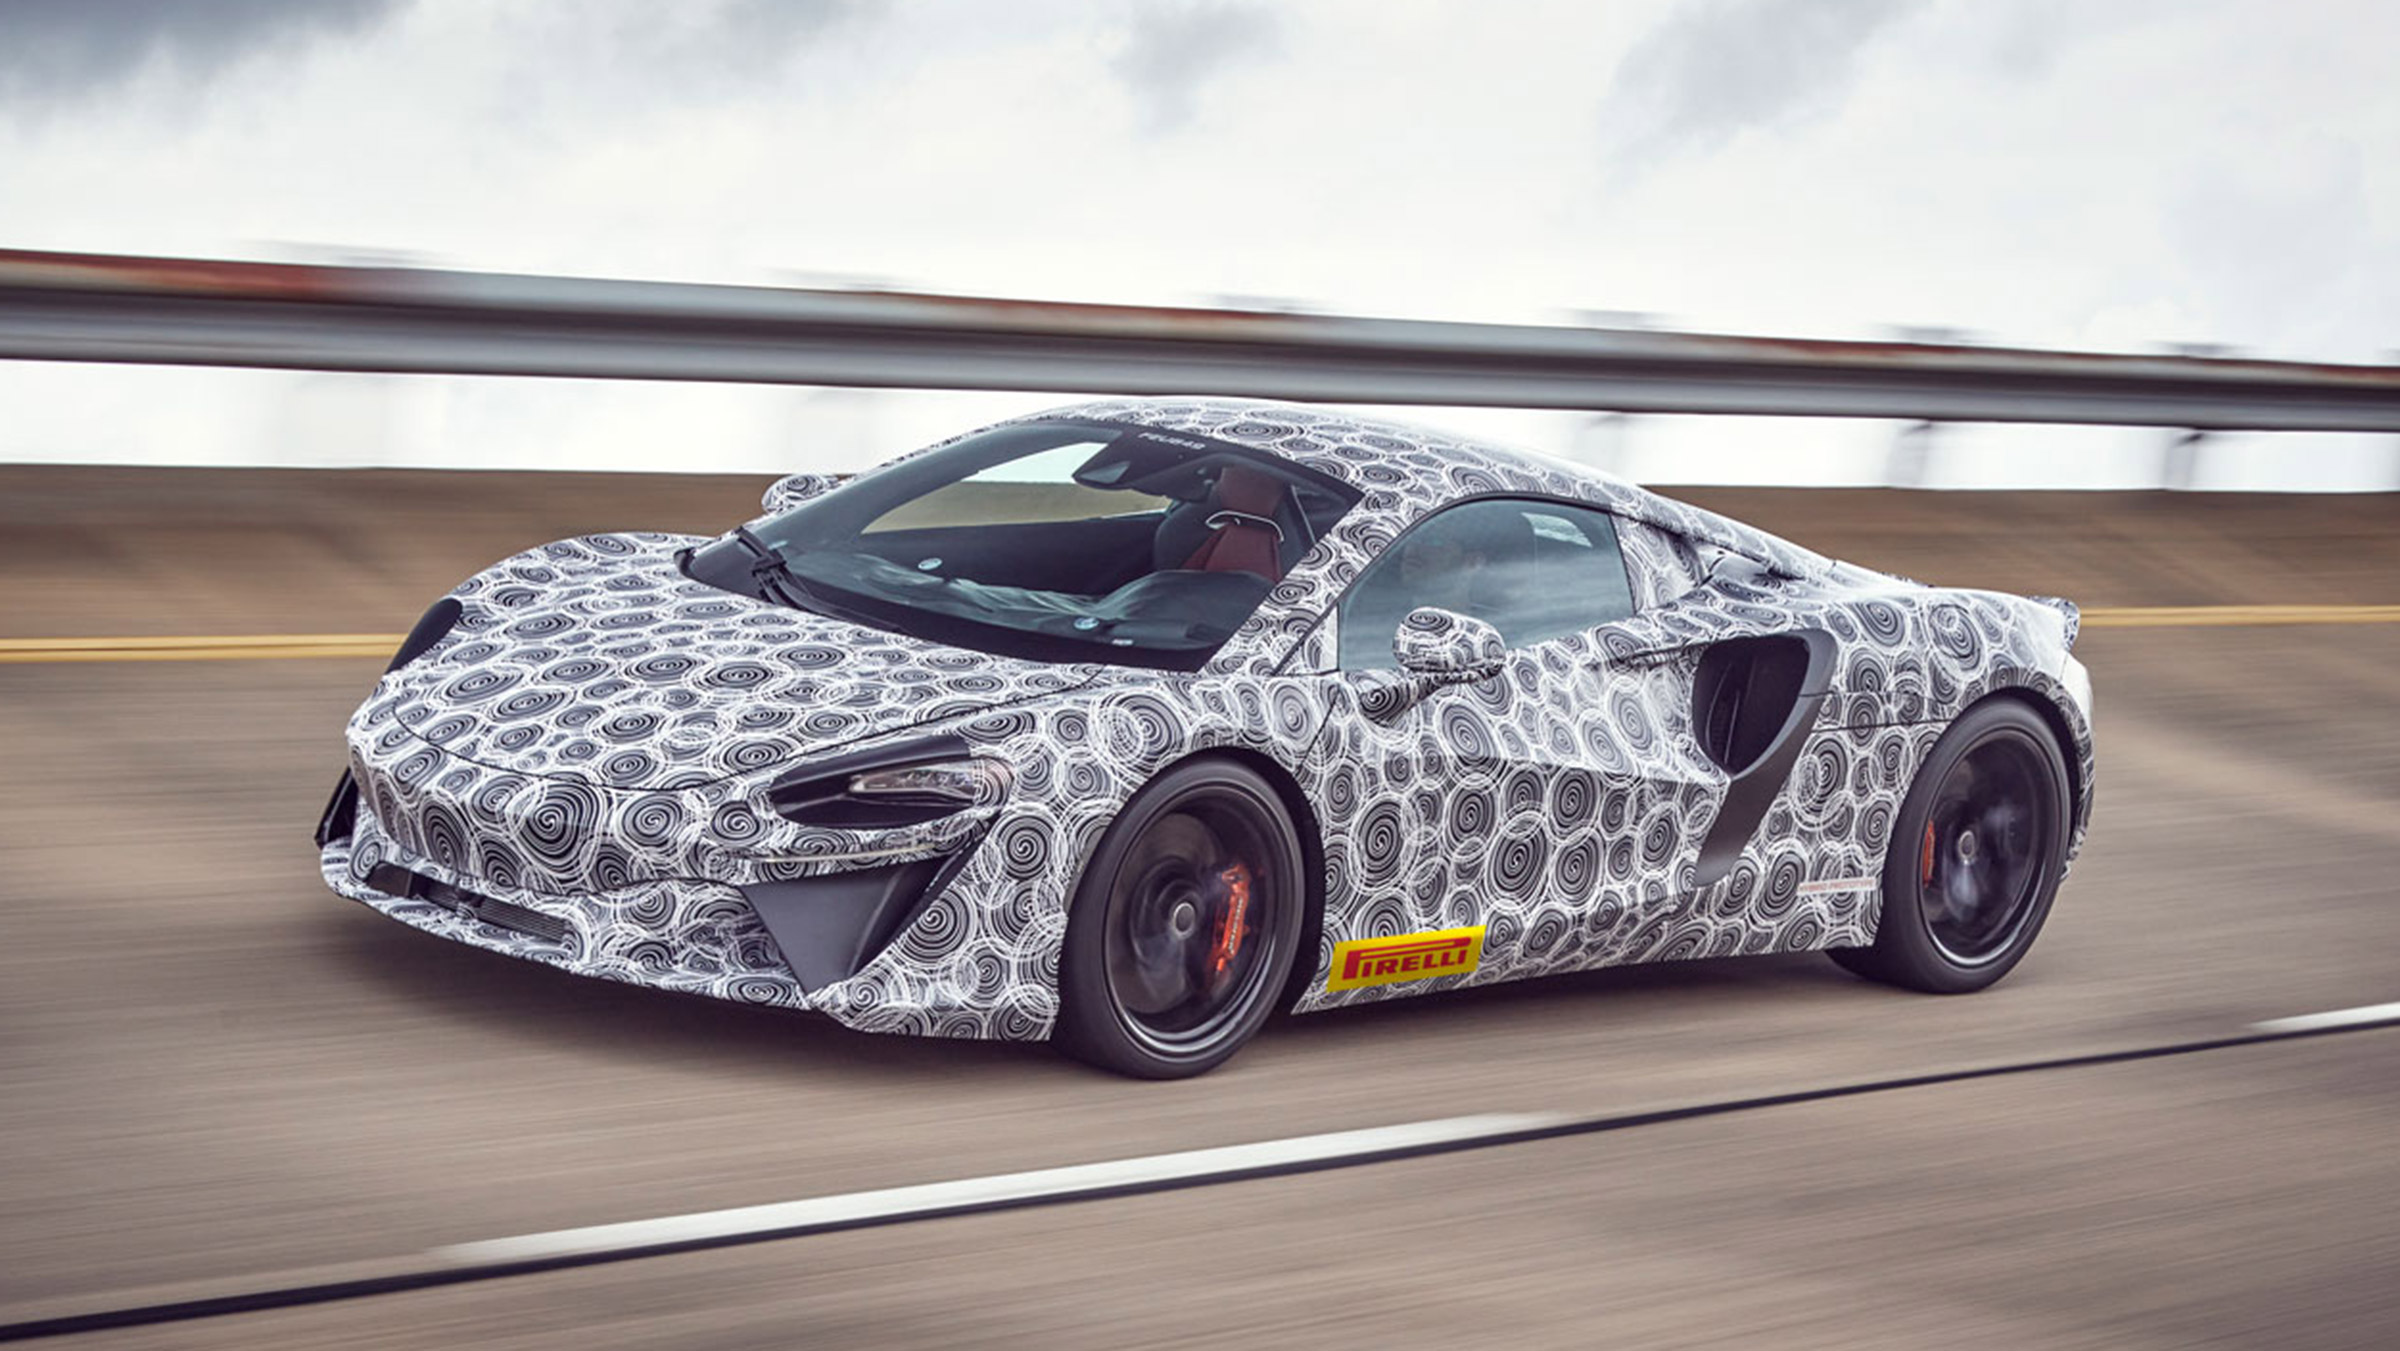 New 2021 McLaren V6 hybrid supercar confirmed   Auto Express